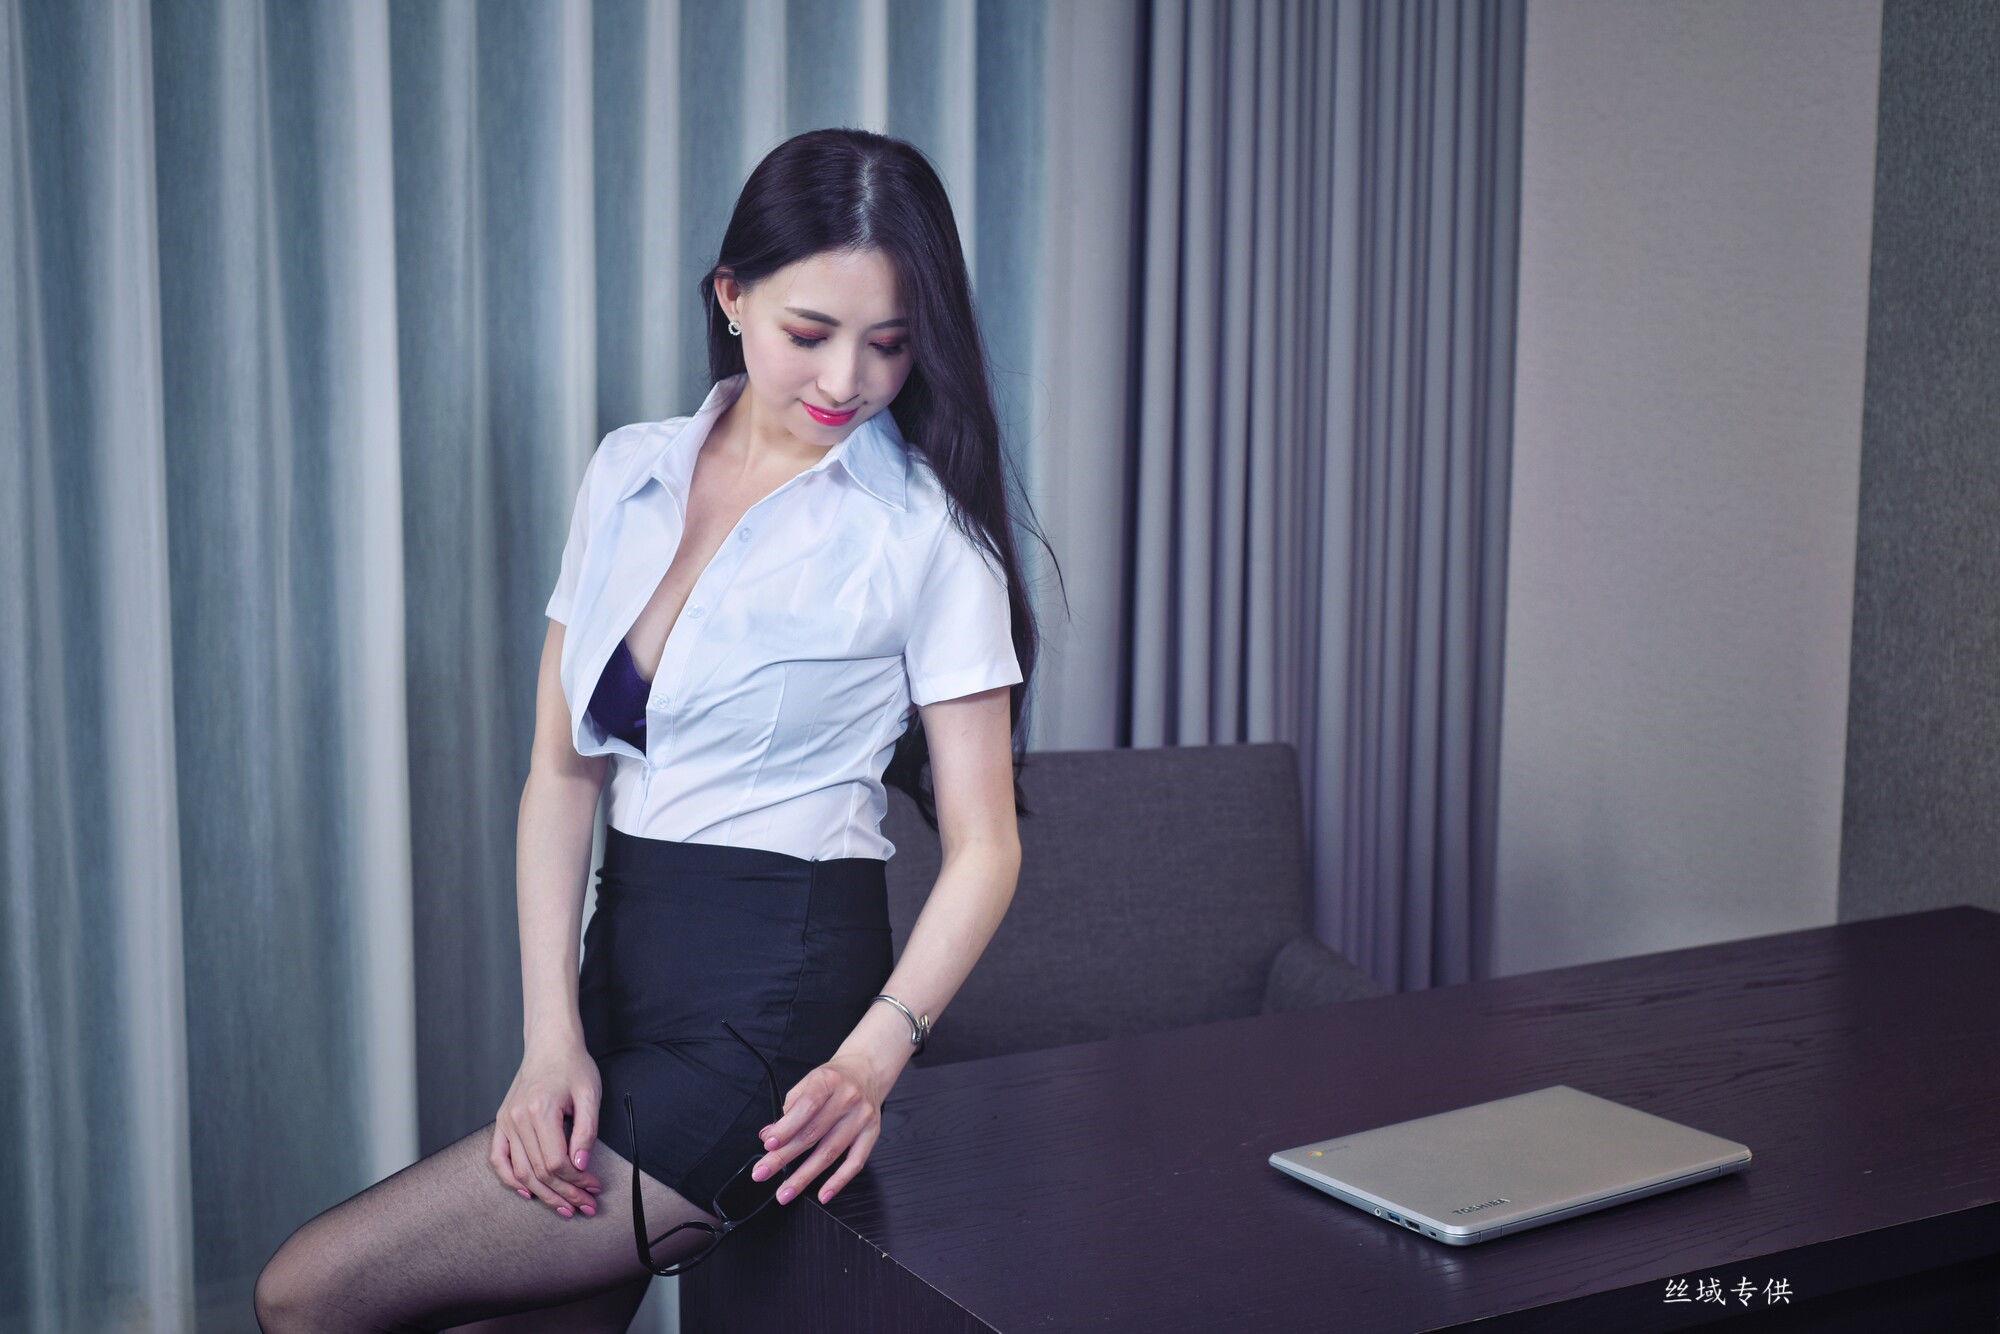 VOL.64 [台湾正妹]御姐白领丽人:雪菁超高清个人性感漂亮大图(56P)